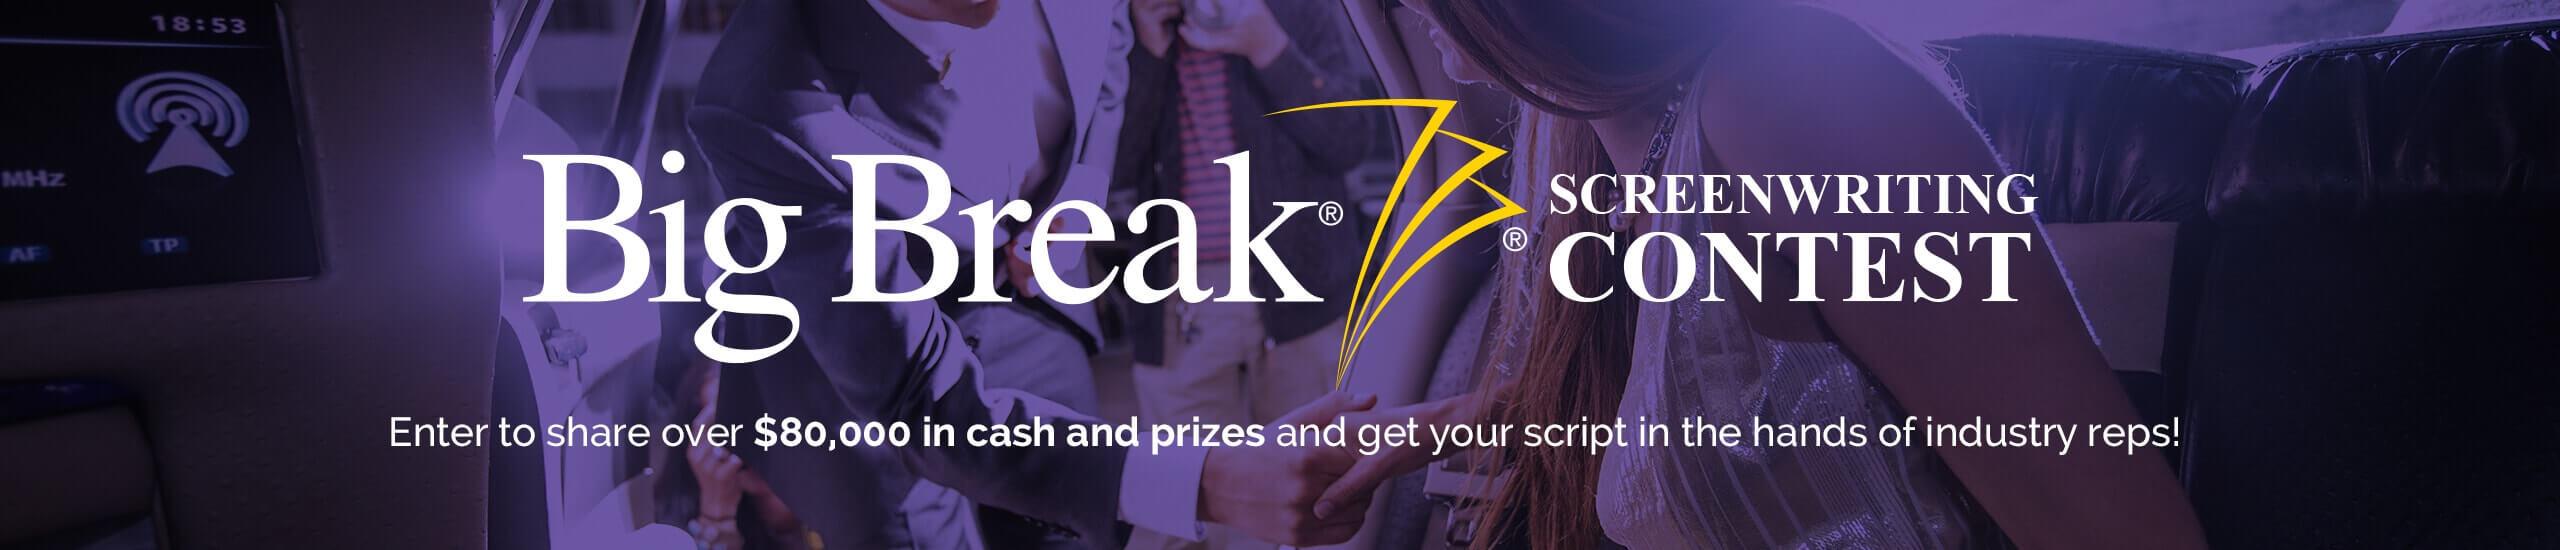 Best Screenwriting Contests - Big Break Final Draft Screenplay Competition